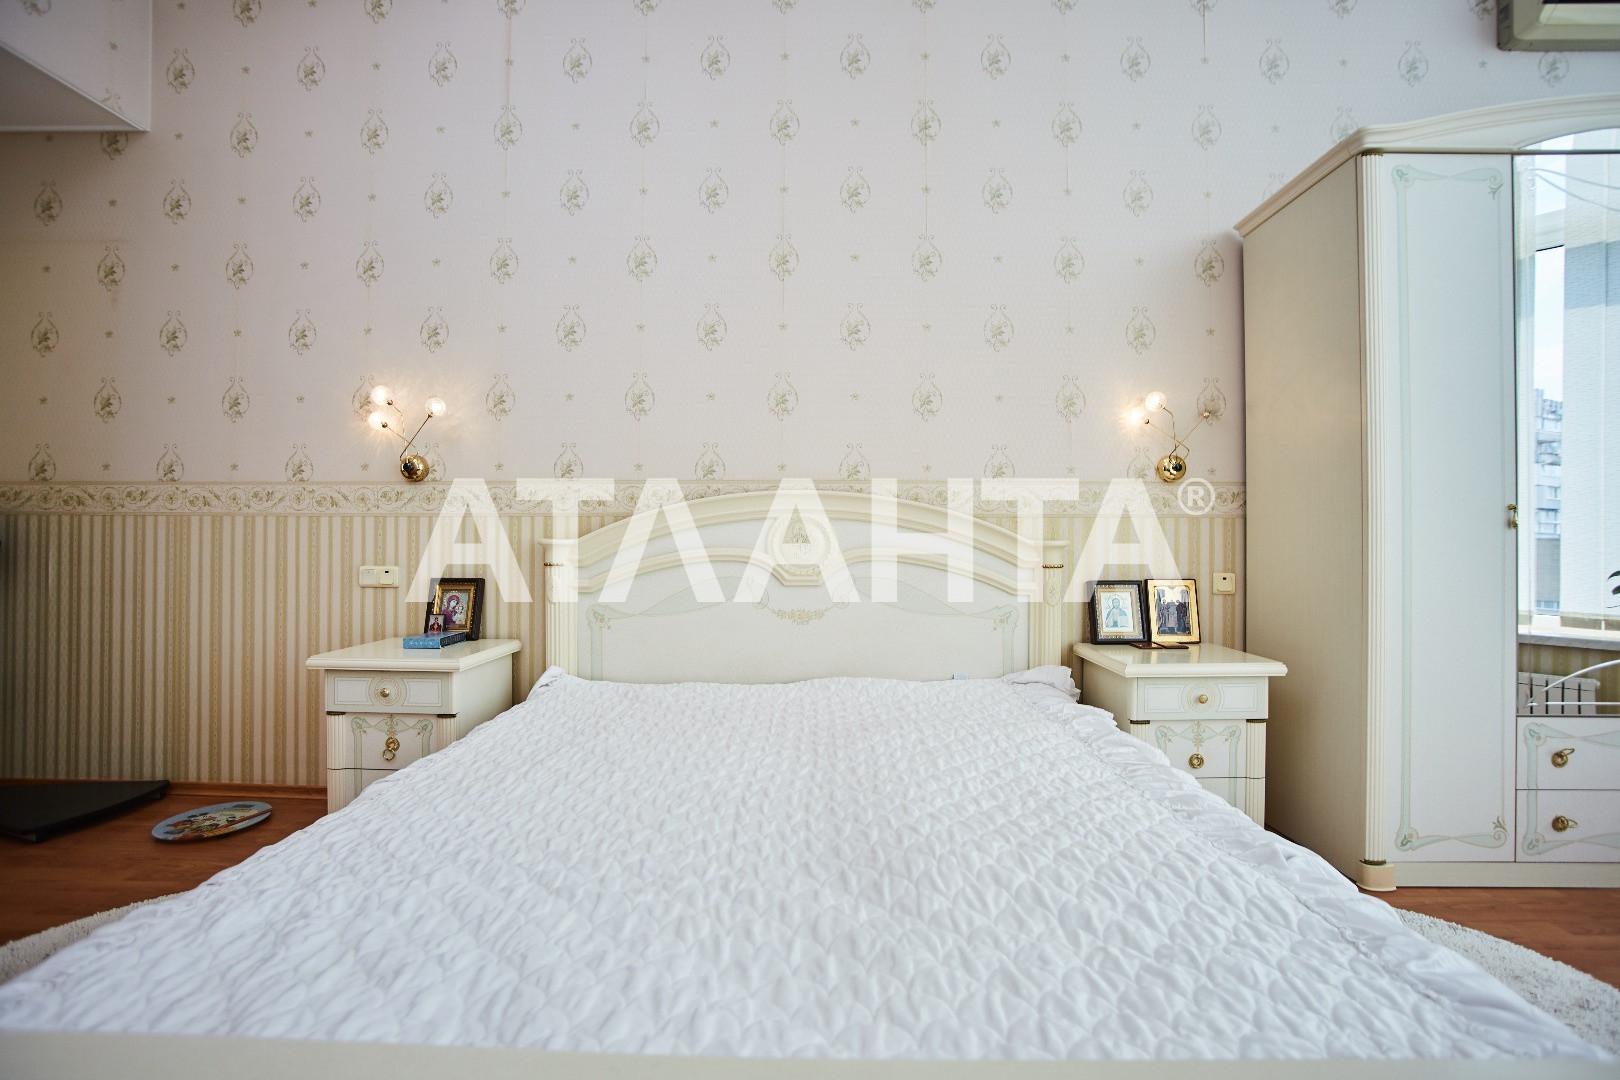 Продается Многоуровневая Квартира на ул. Посмитного — 295 000 у.е. (фото №26)